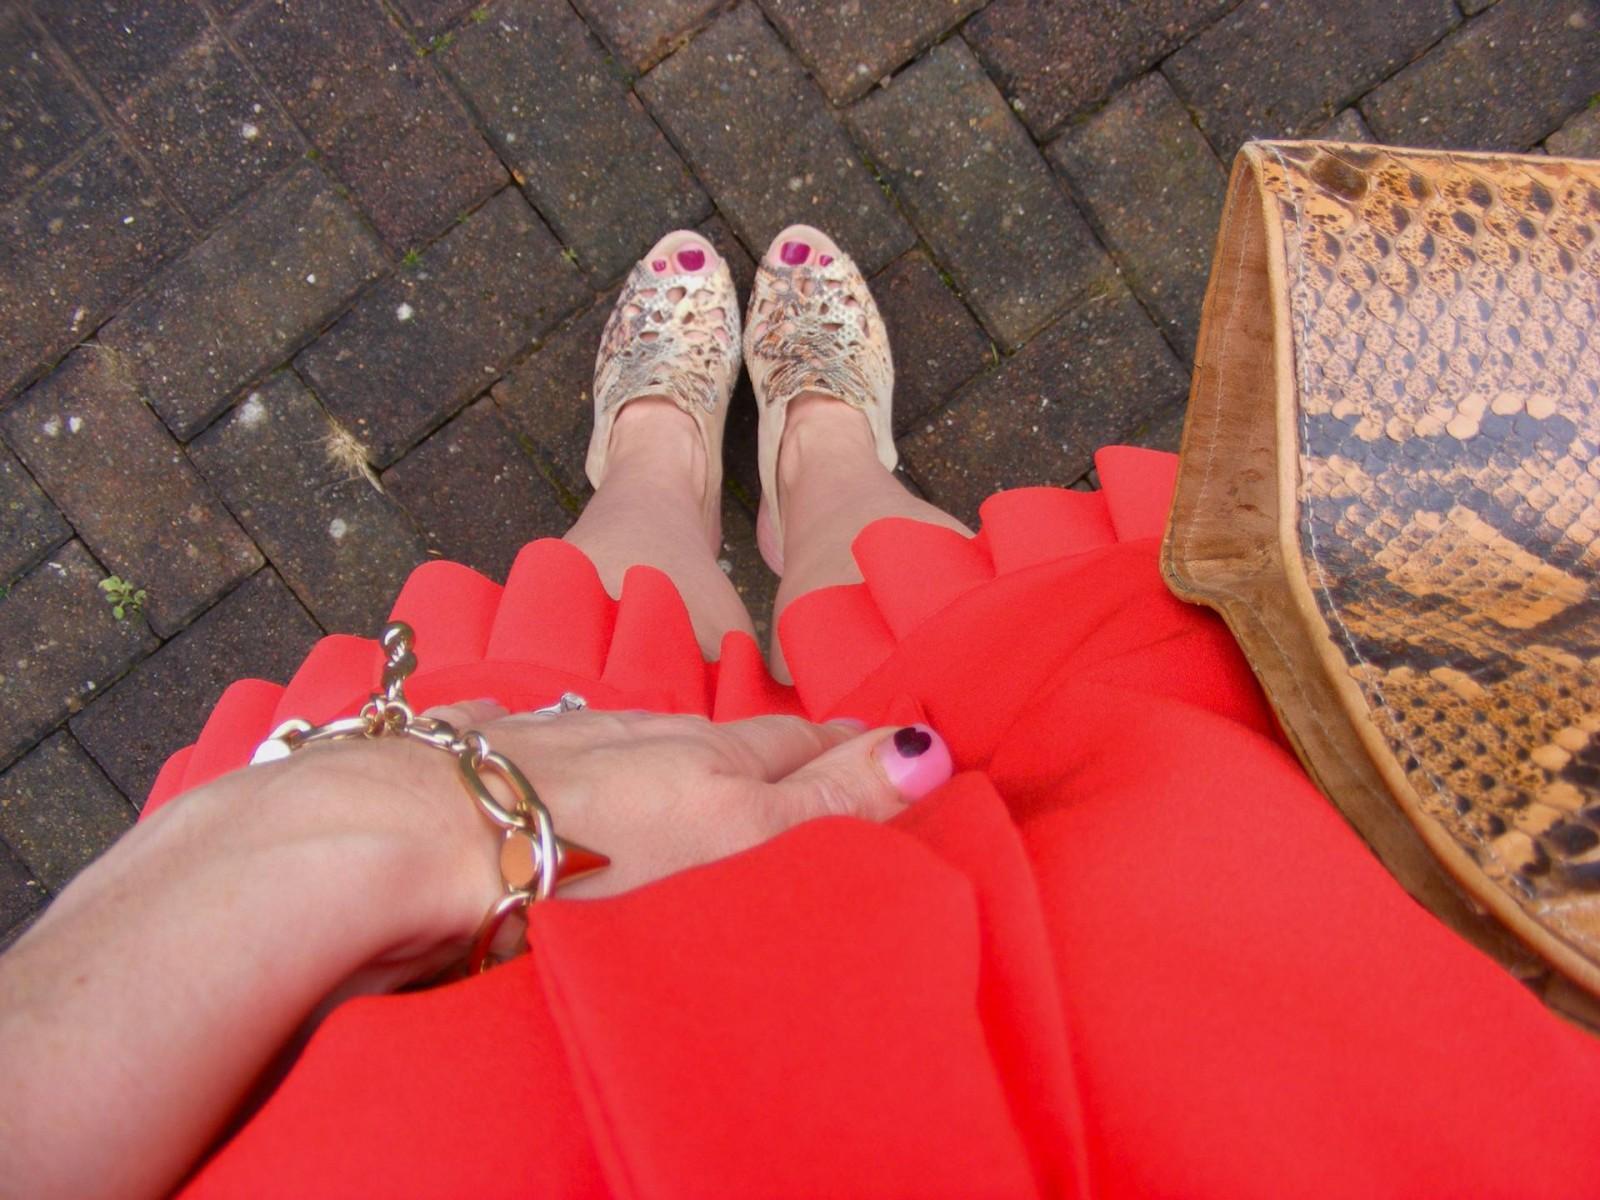 Menbur nude shoes and snakeskin bag